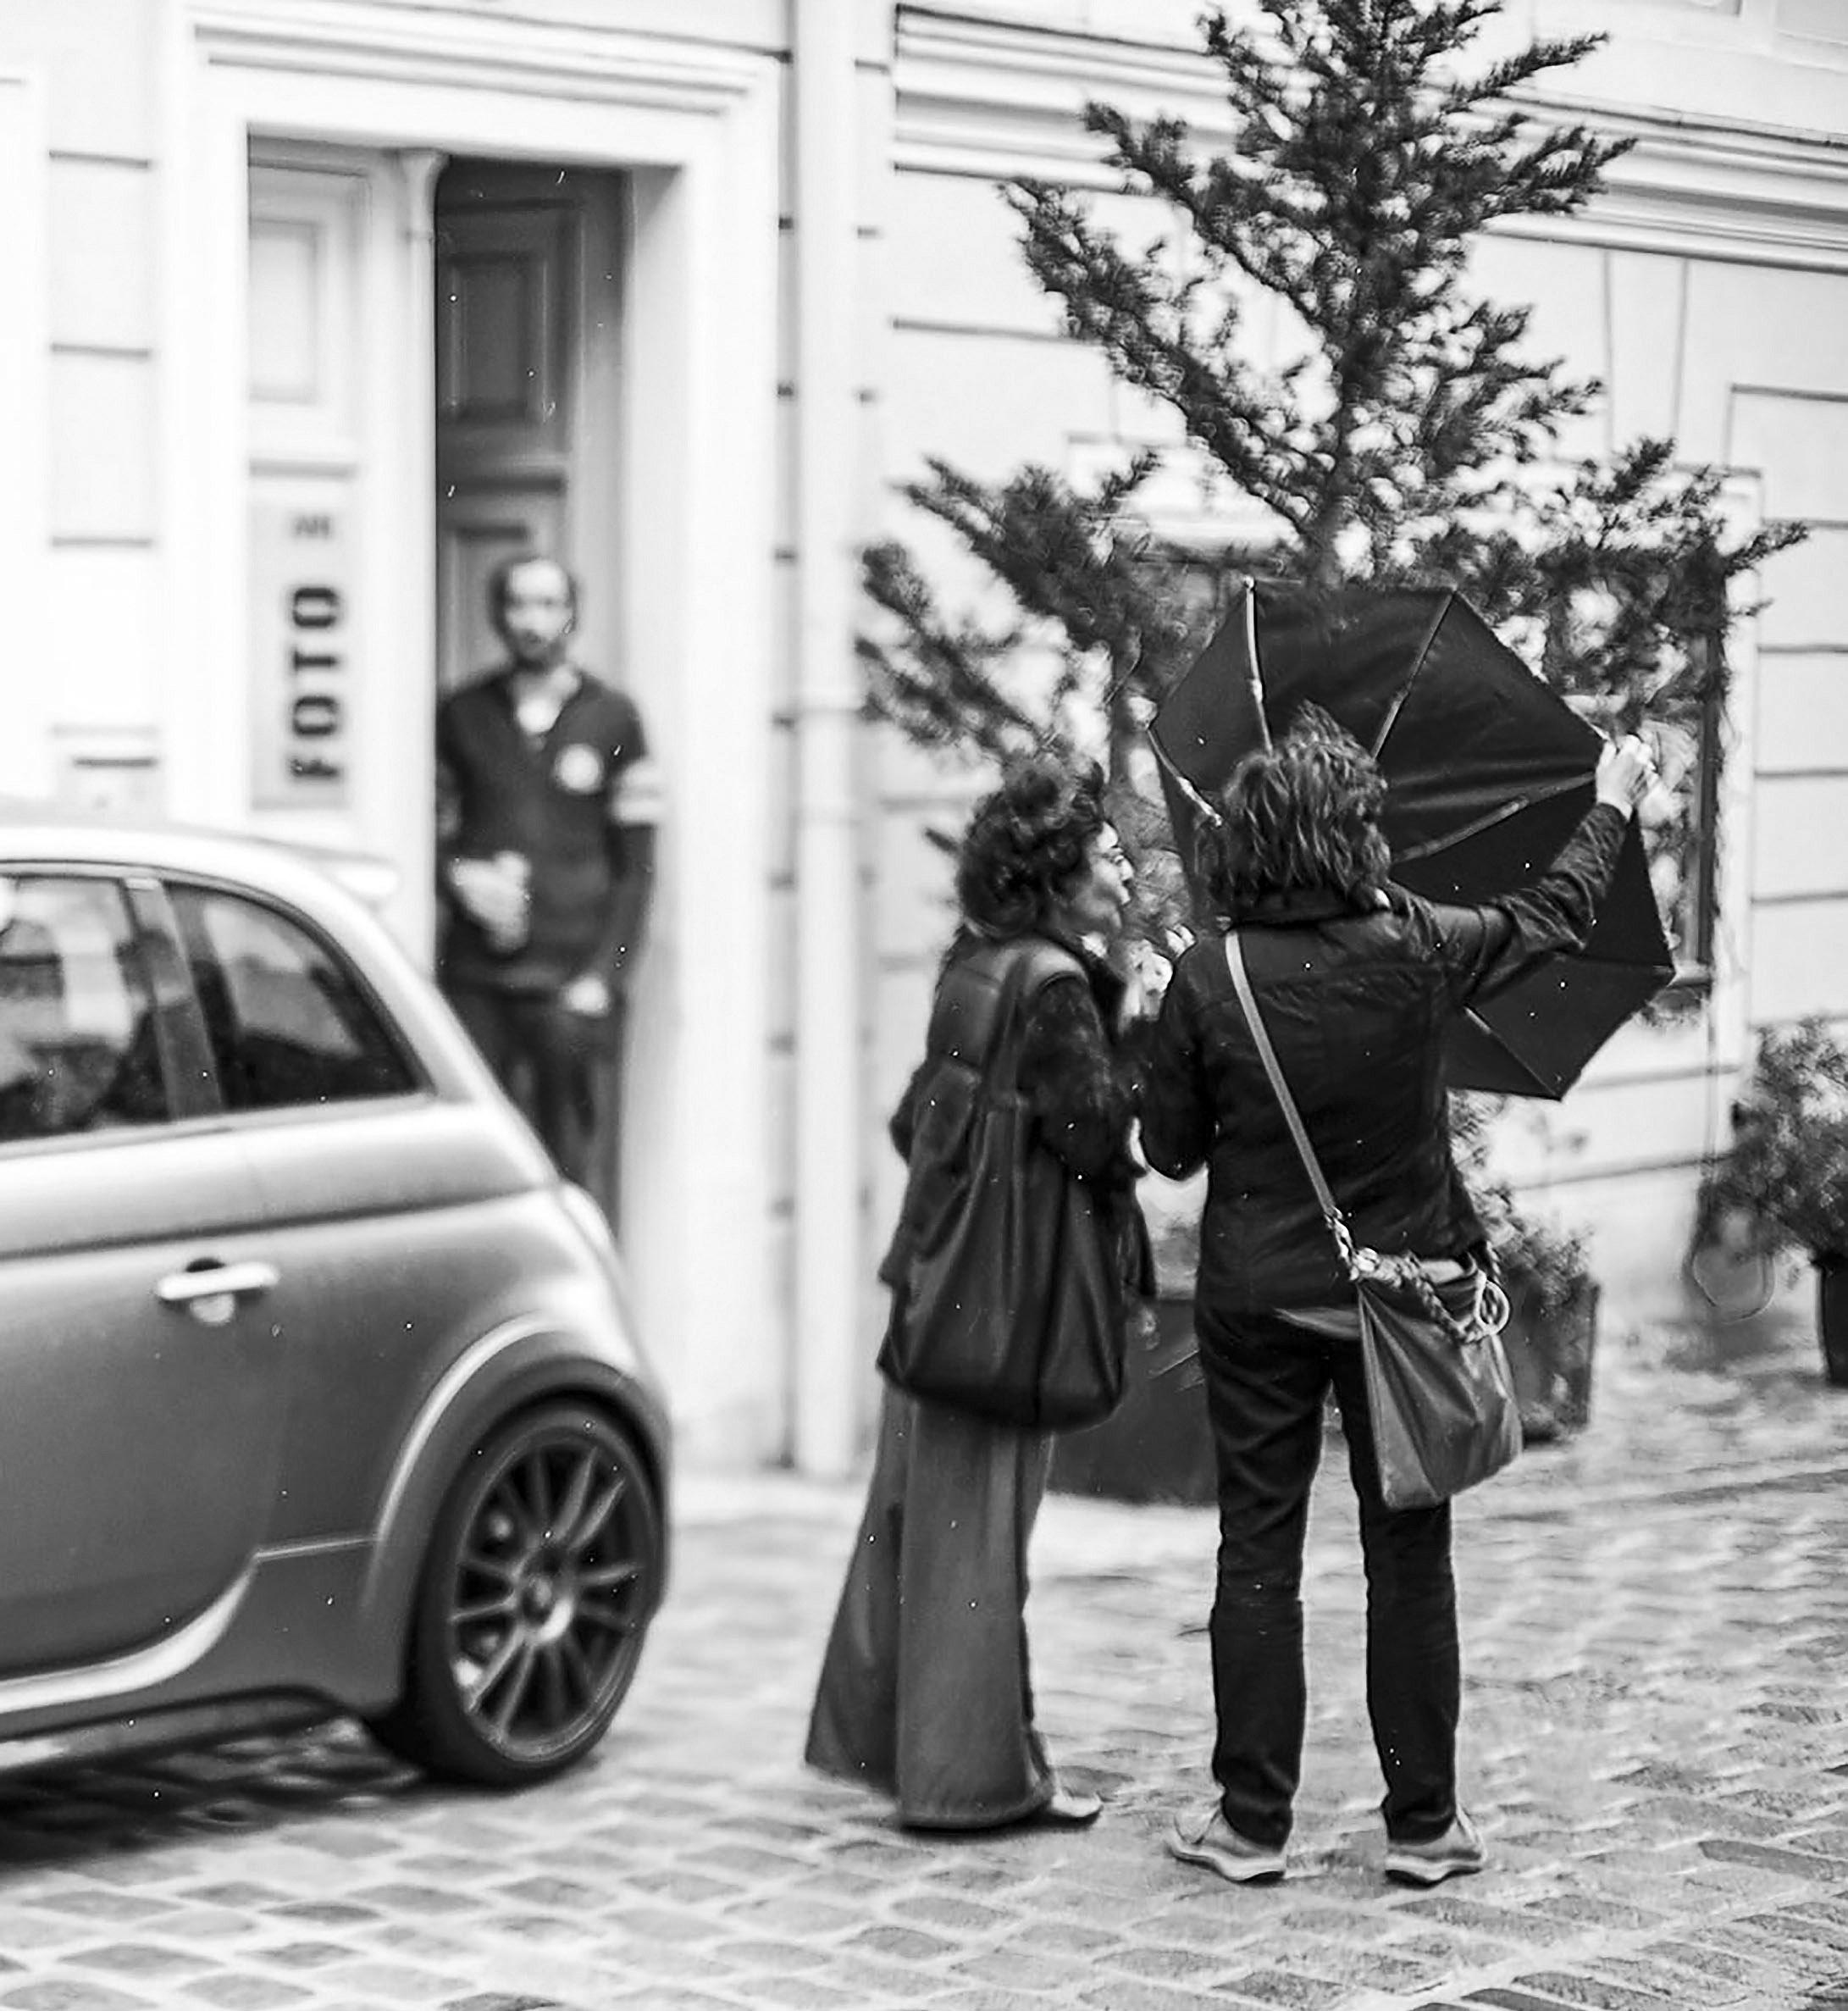 Sommerakademie_Wien_Fotografie_050.jpg